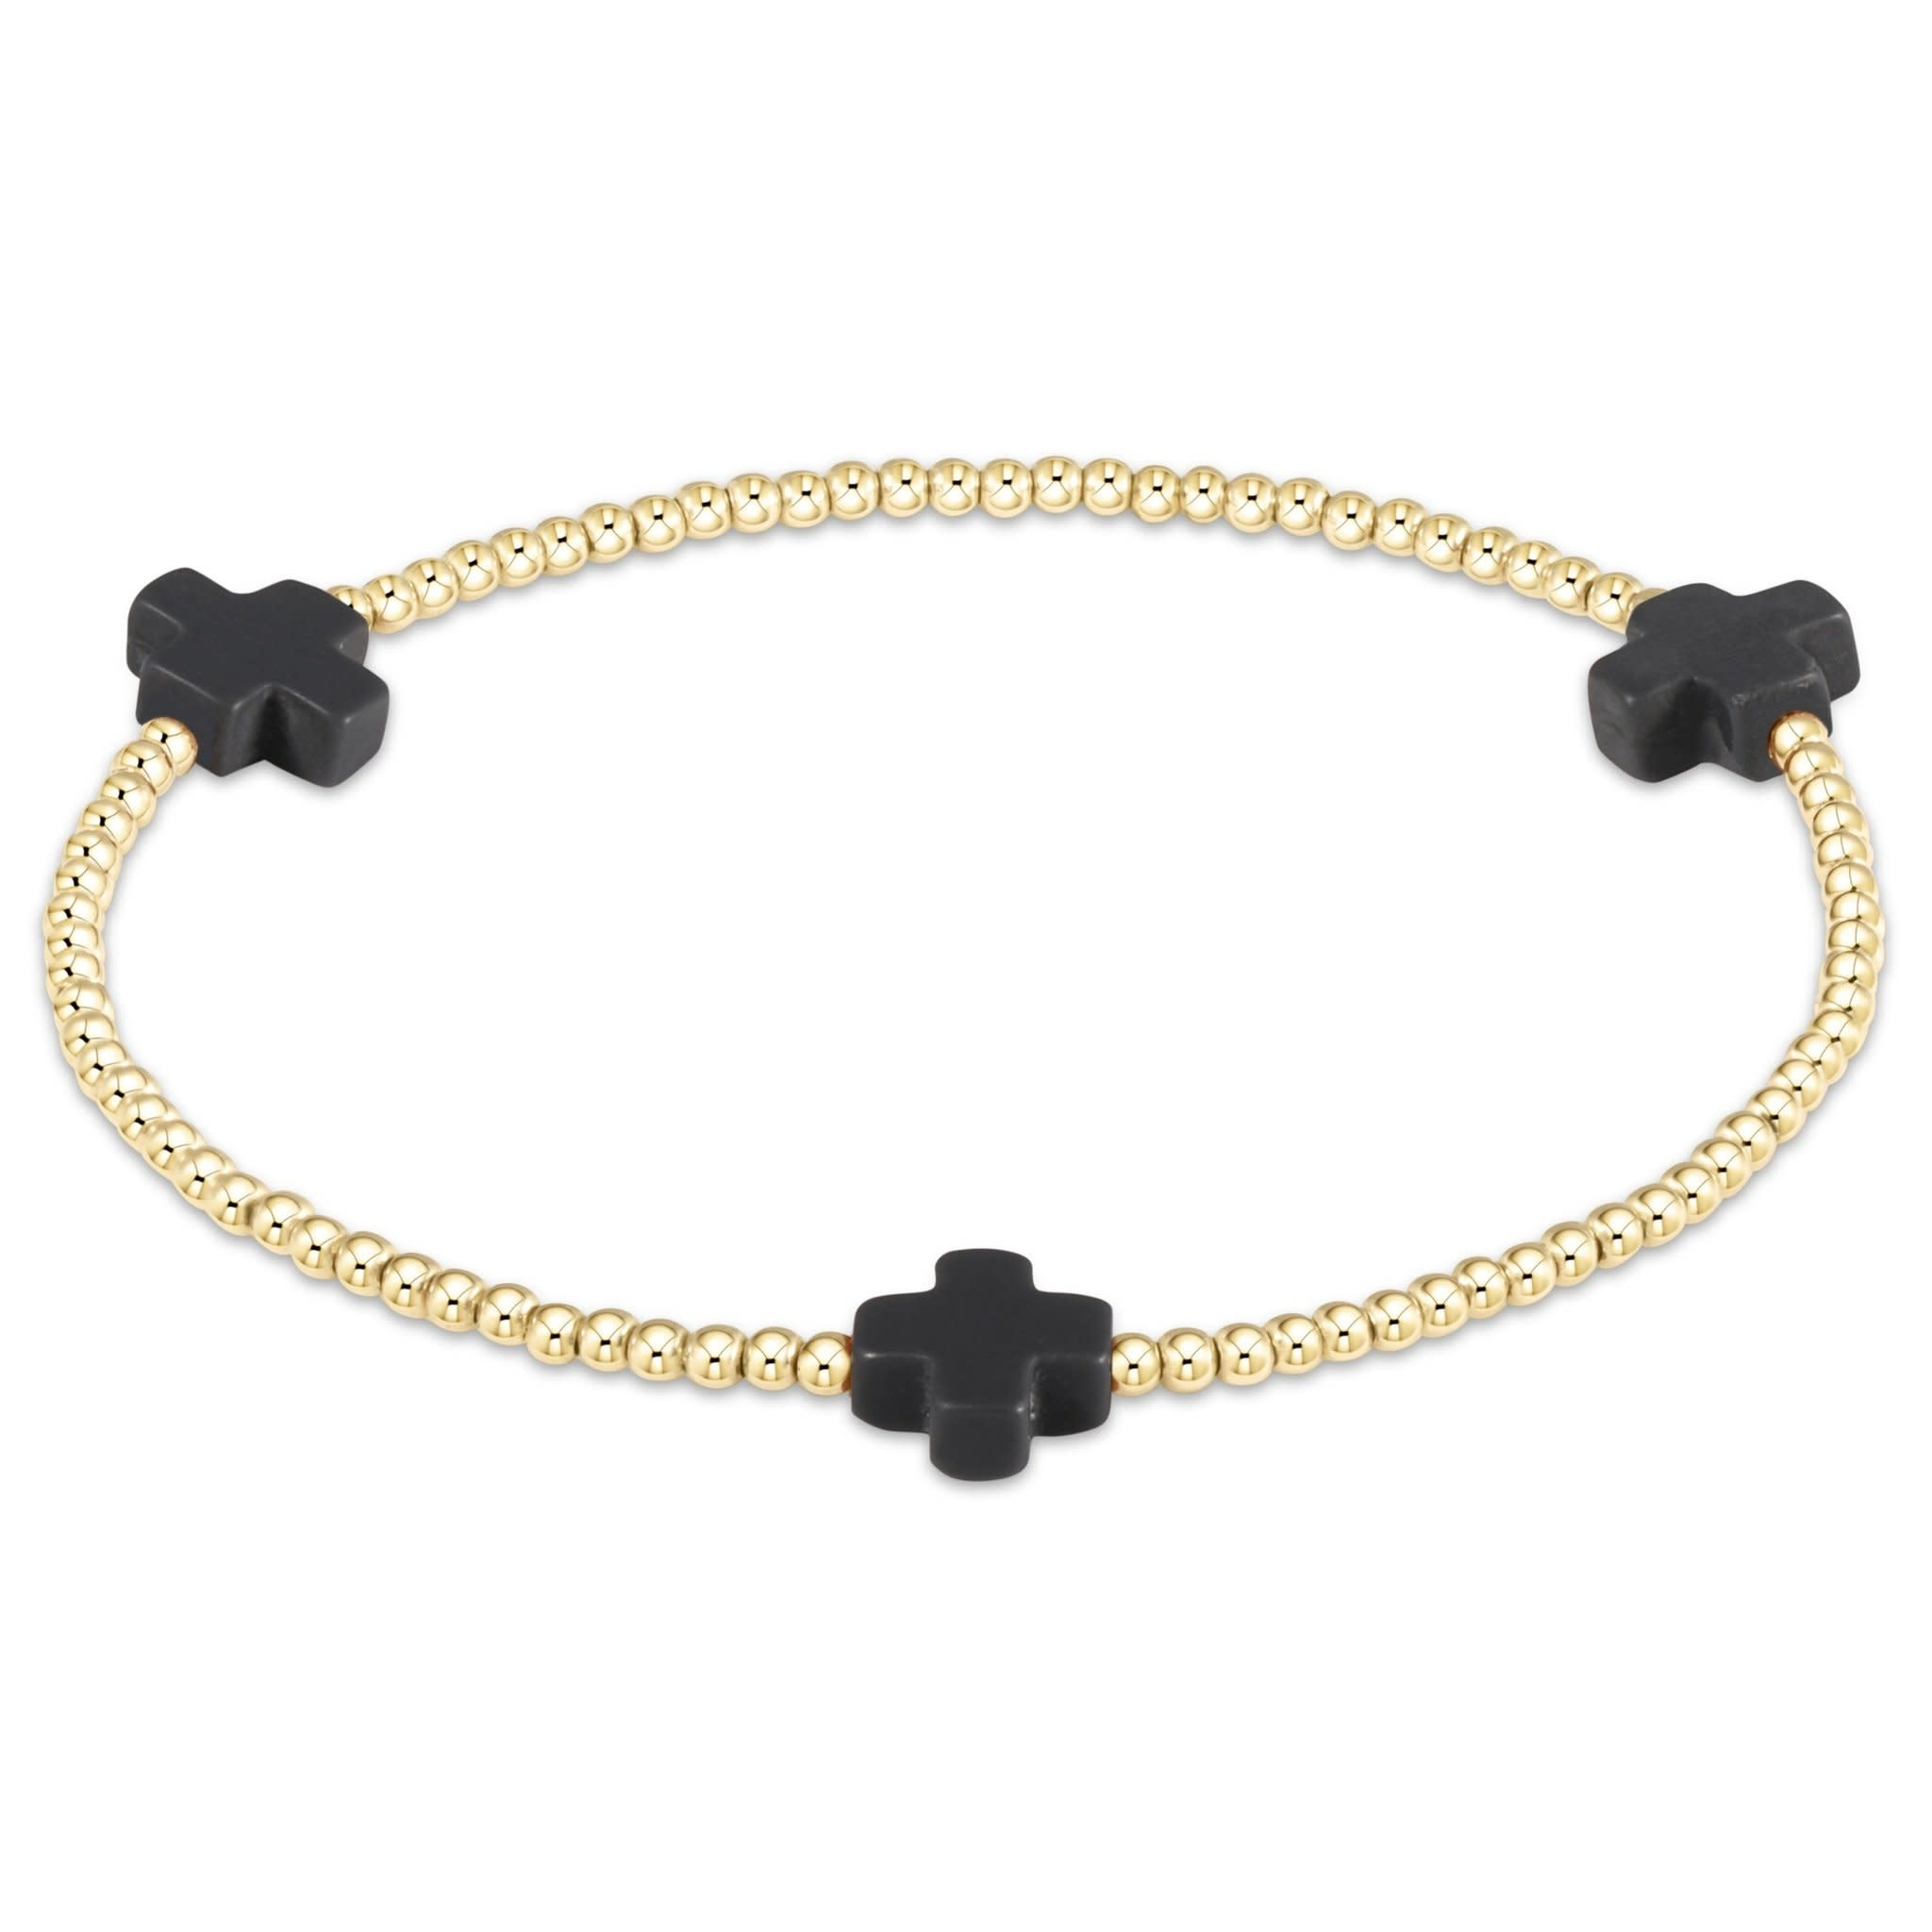 Extends Cross 3mm Charcoal Bracelet